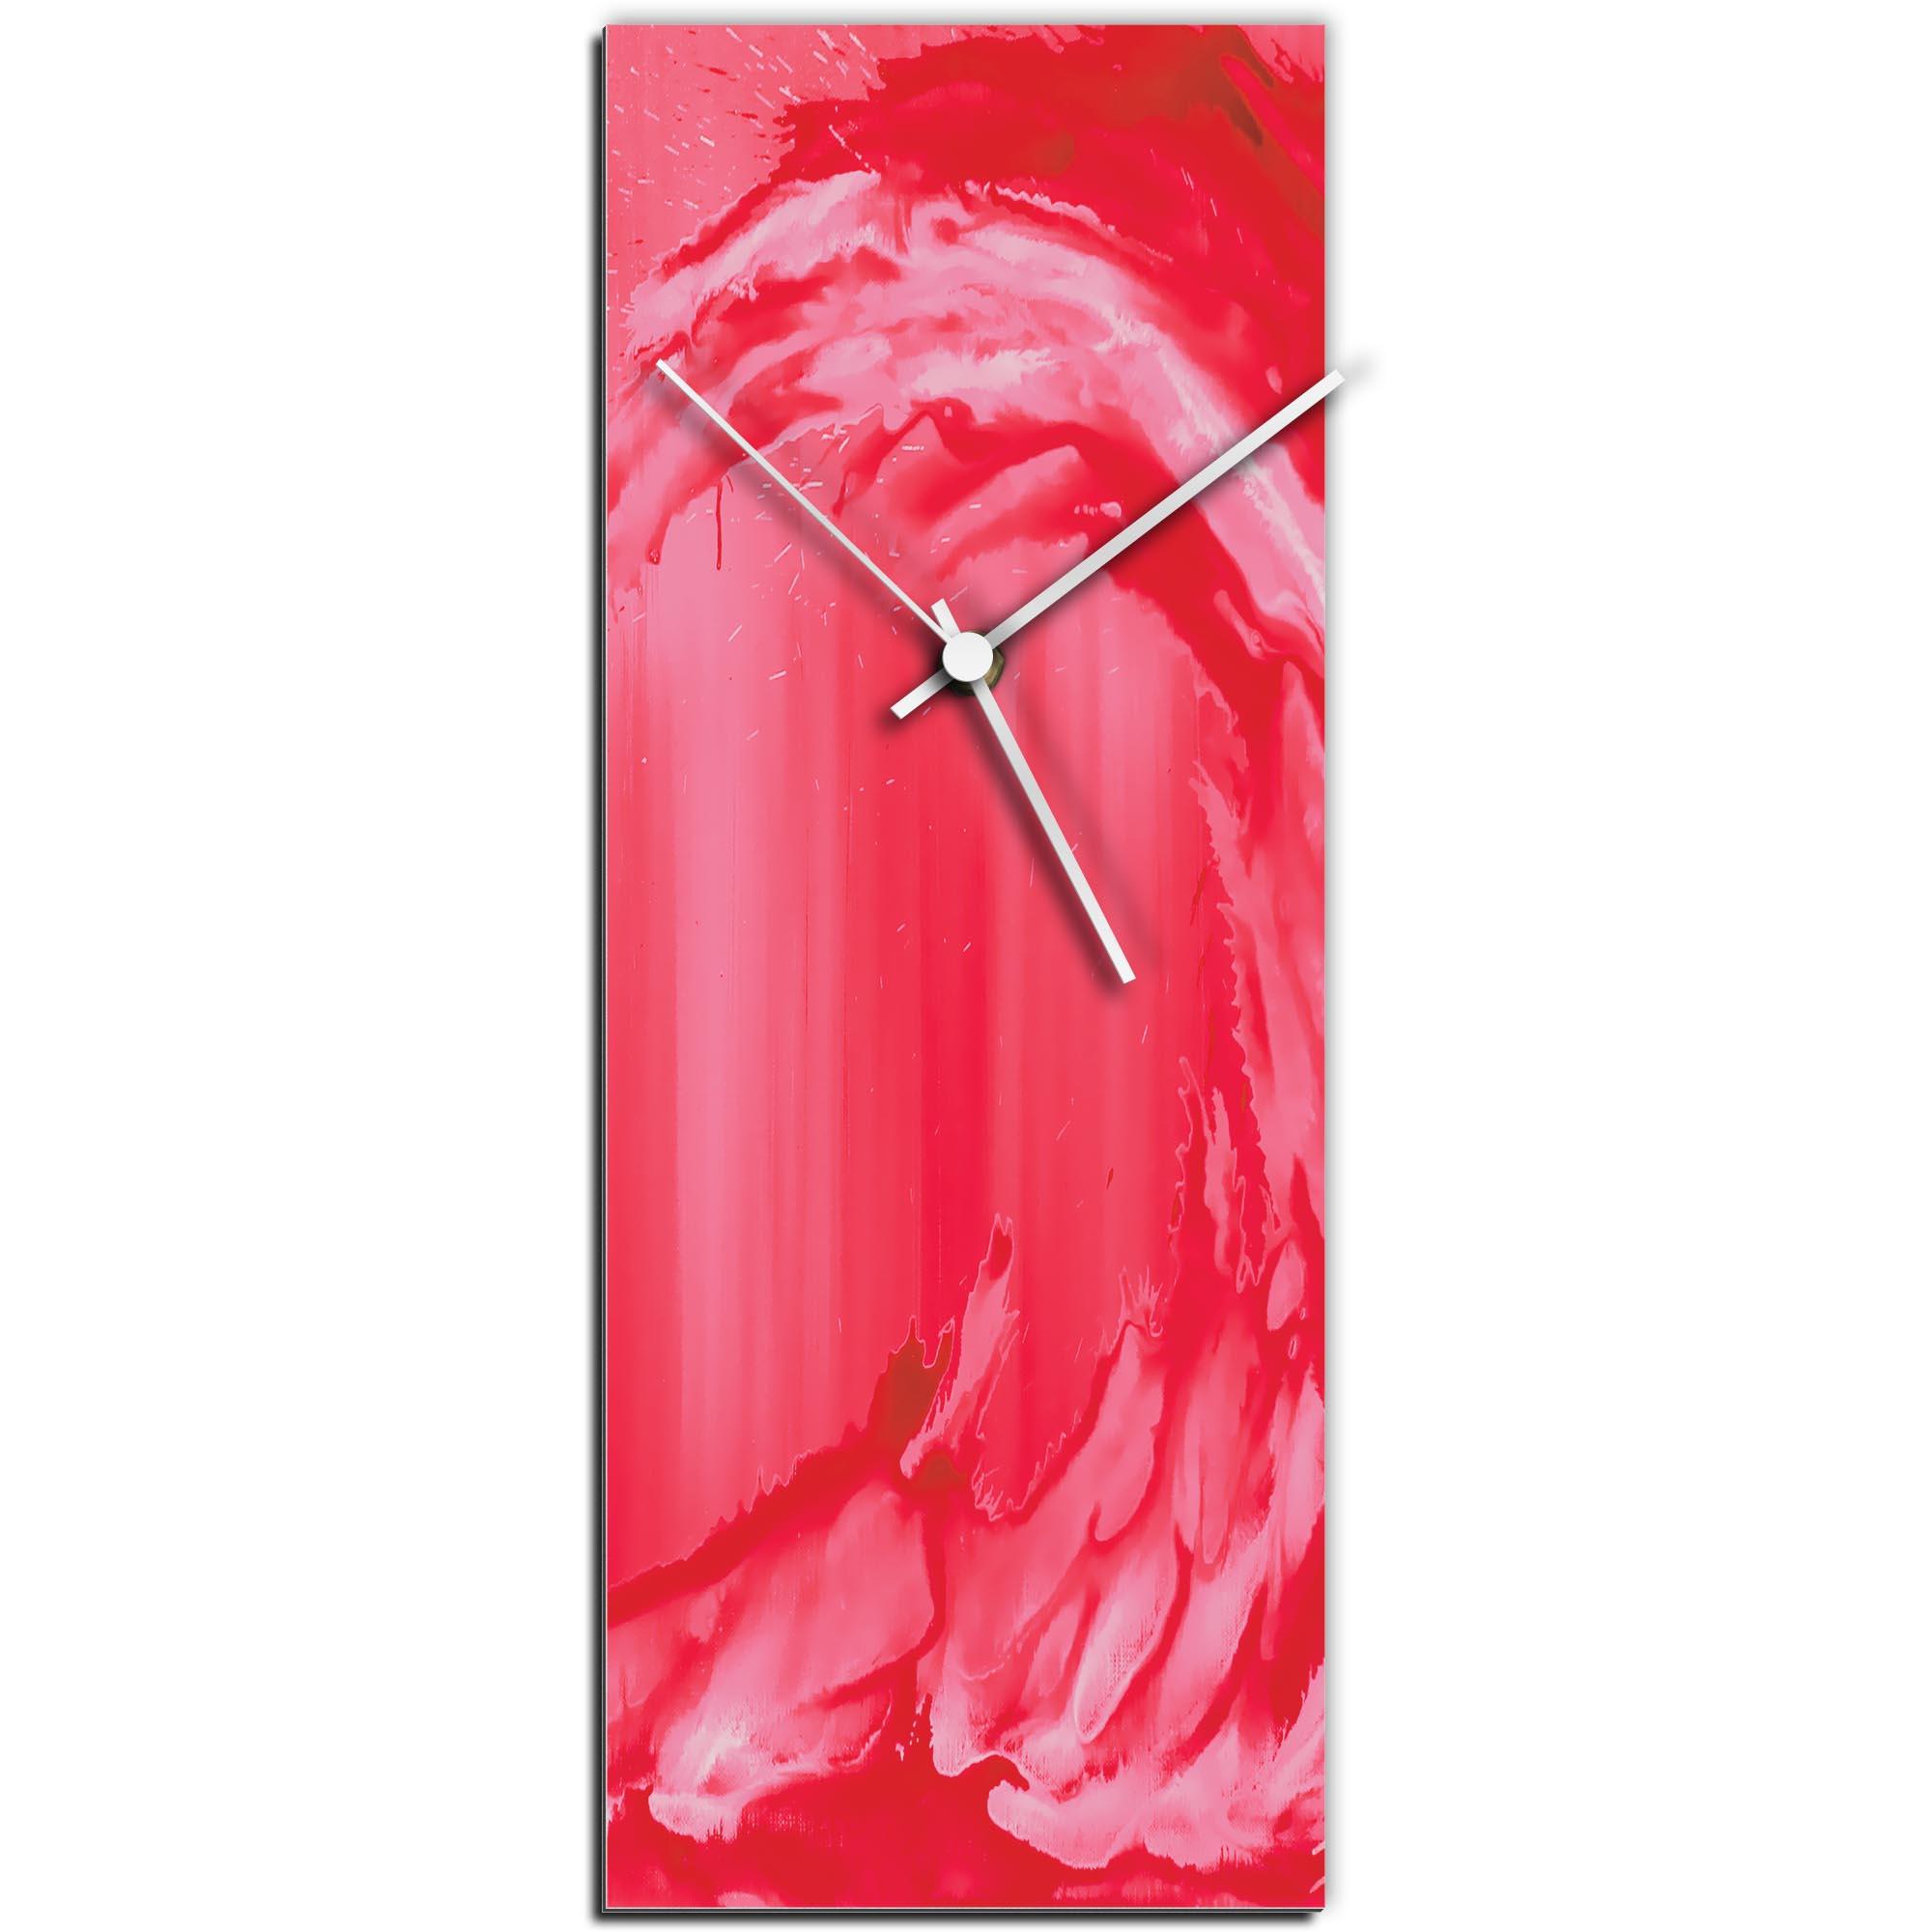 Mendo Vasilevski 'Red Wave v2 Clock' 6in x 16in Modern Wall Clock on Aluminum Composite